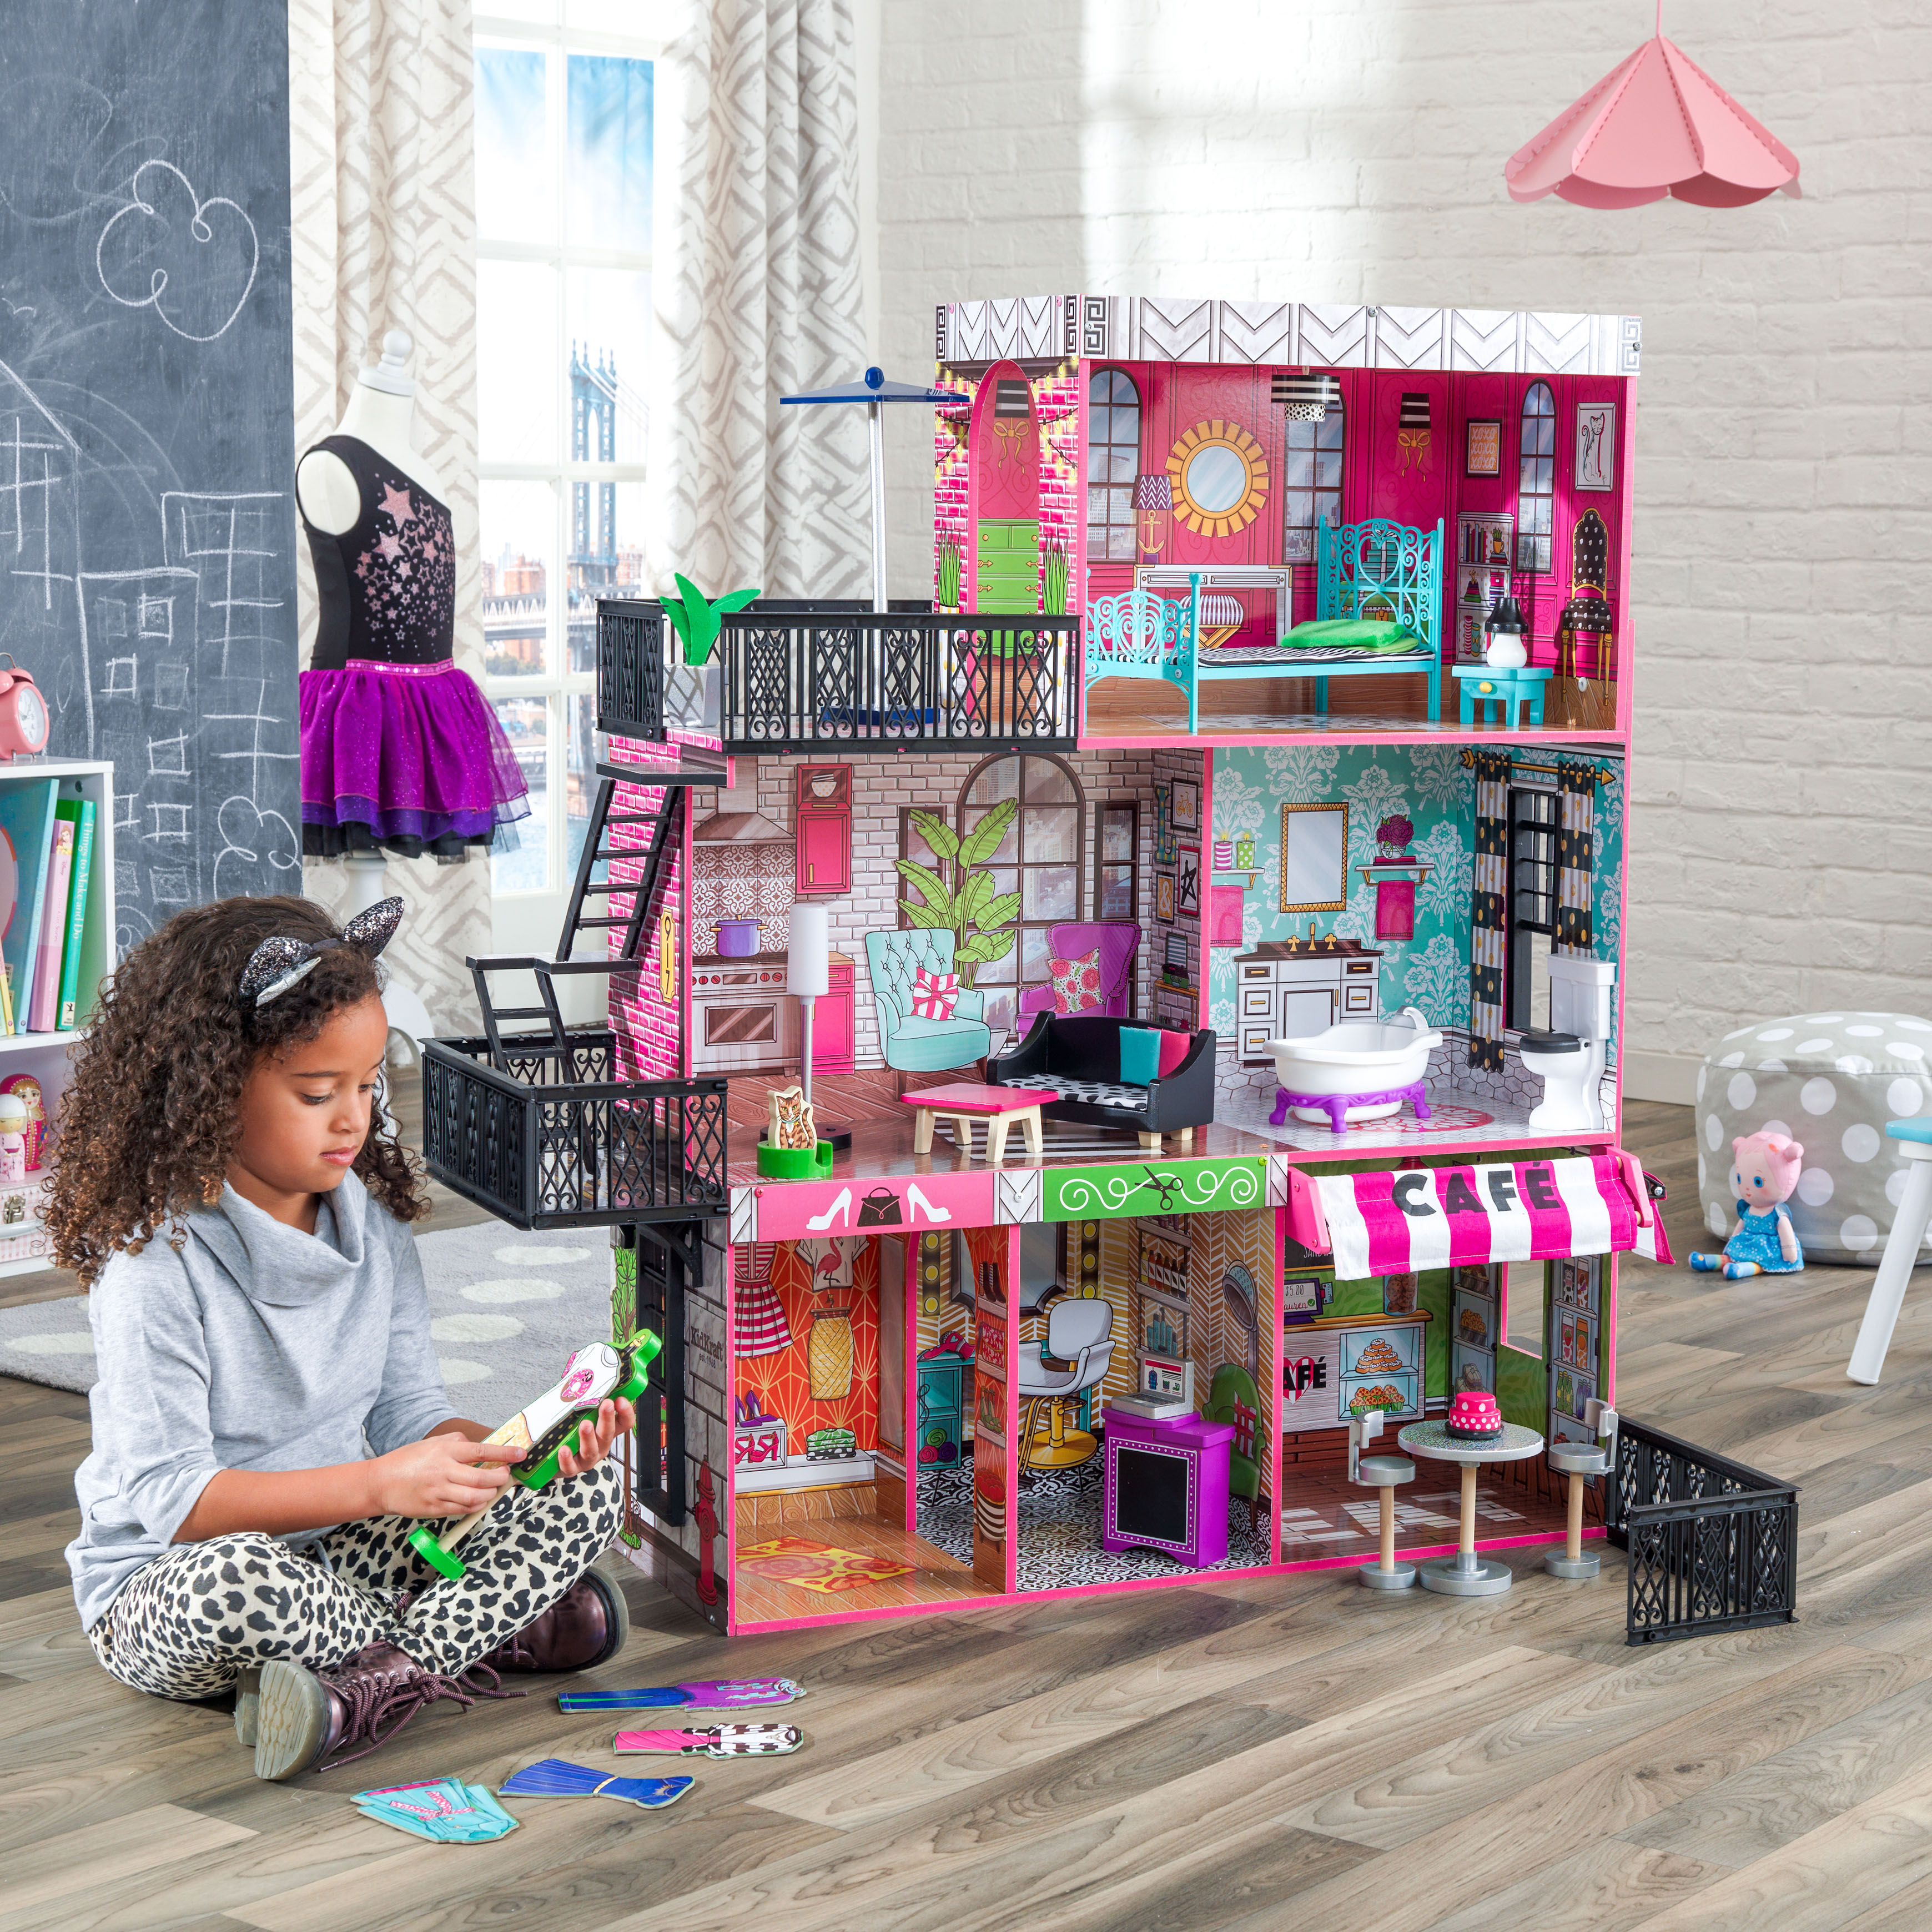 Details about Barbie Size Loft Dollhouse Furniture Girls Playhouse 25  fashionable Accessories